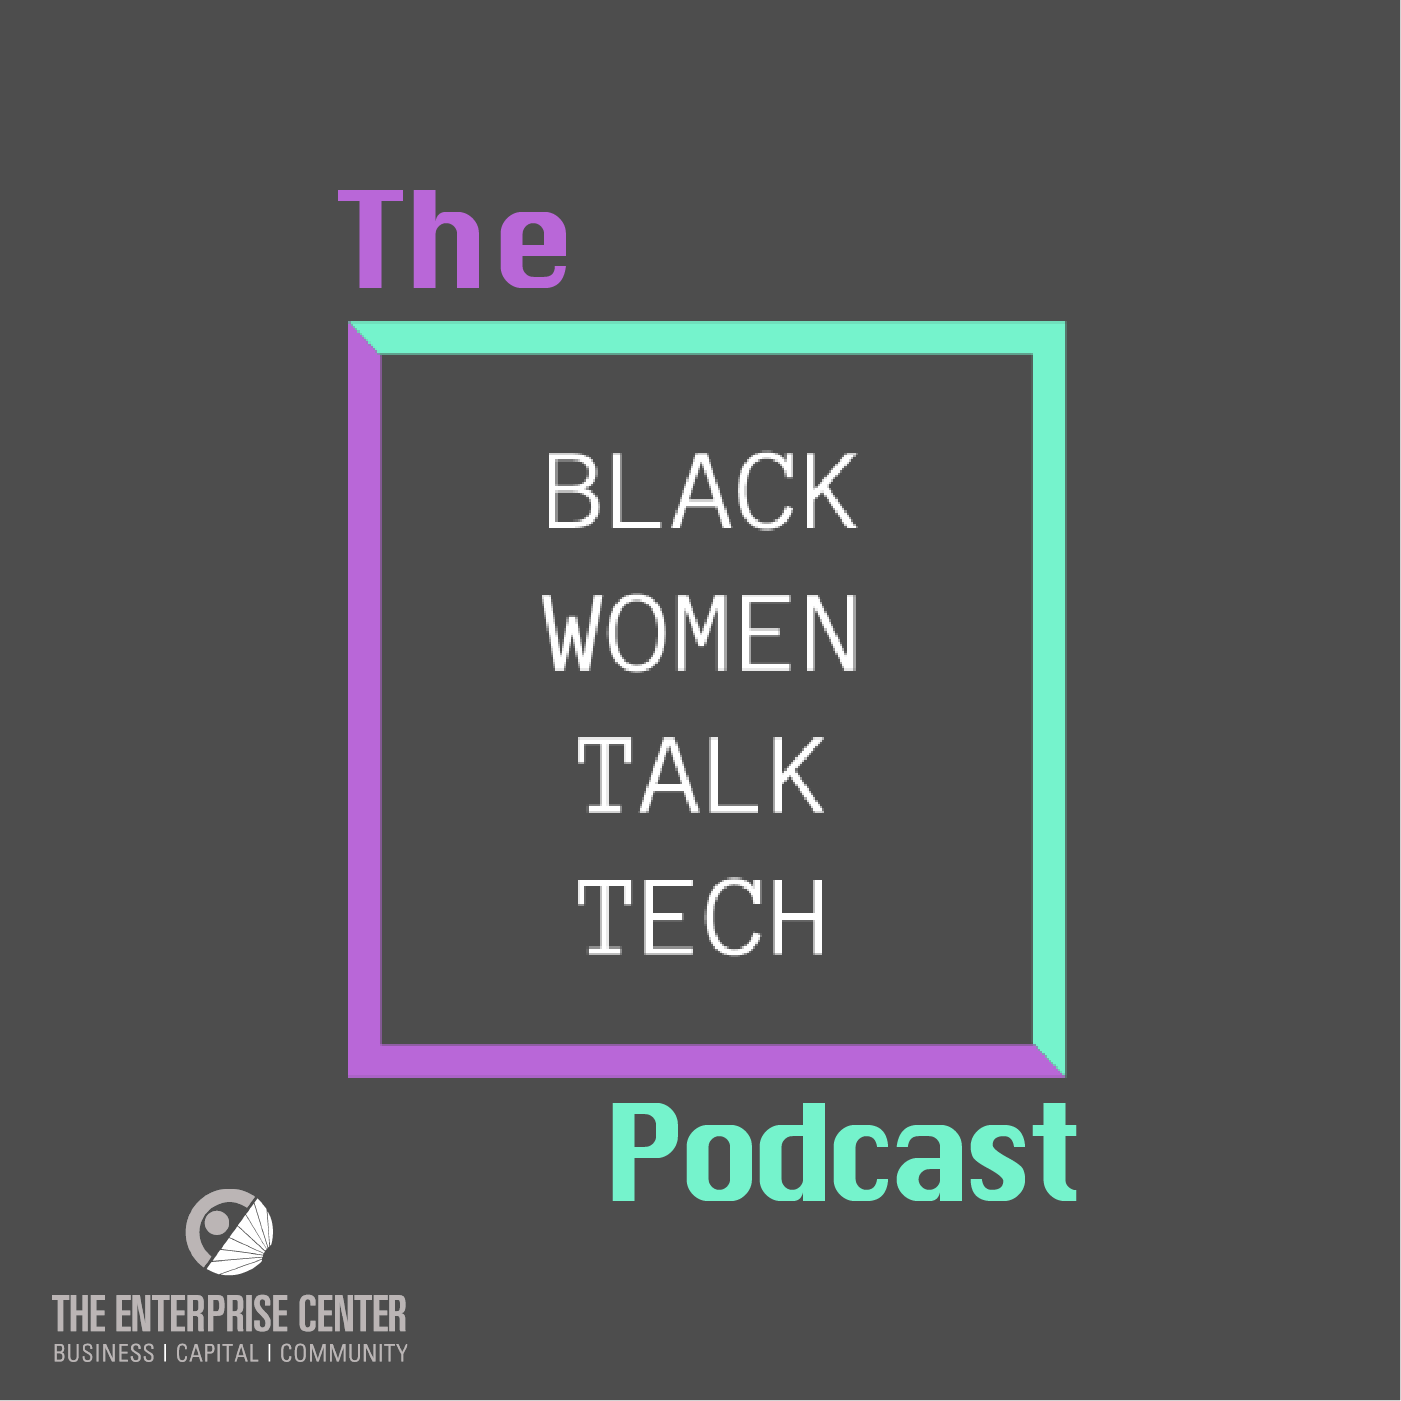 The Black Women Talk Tech Podcast